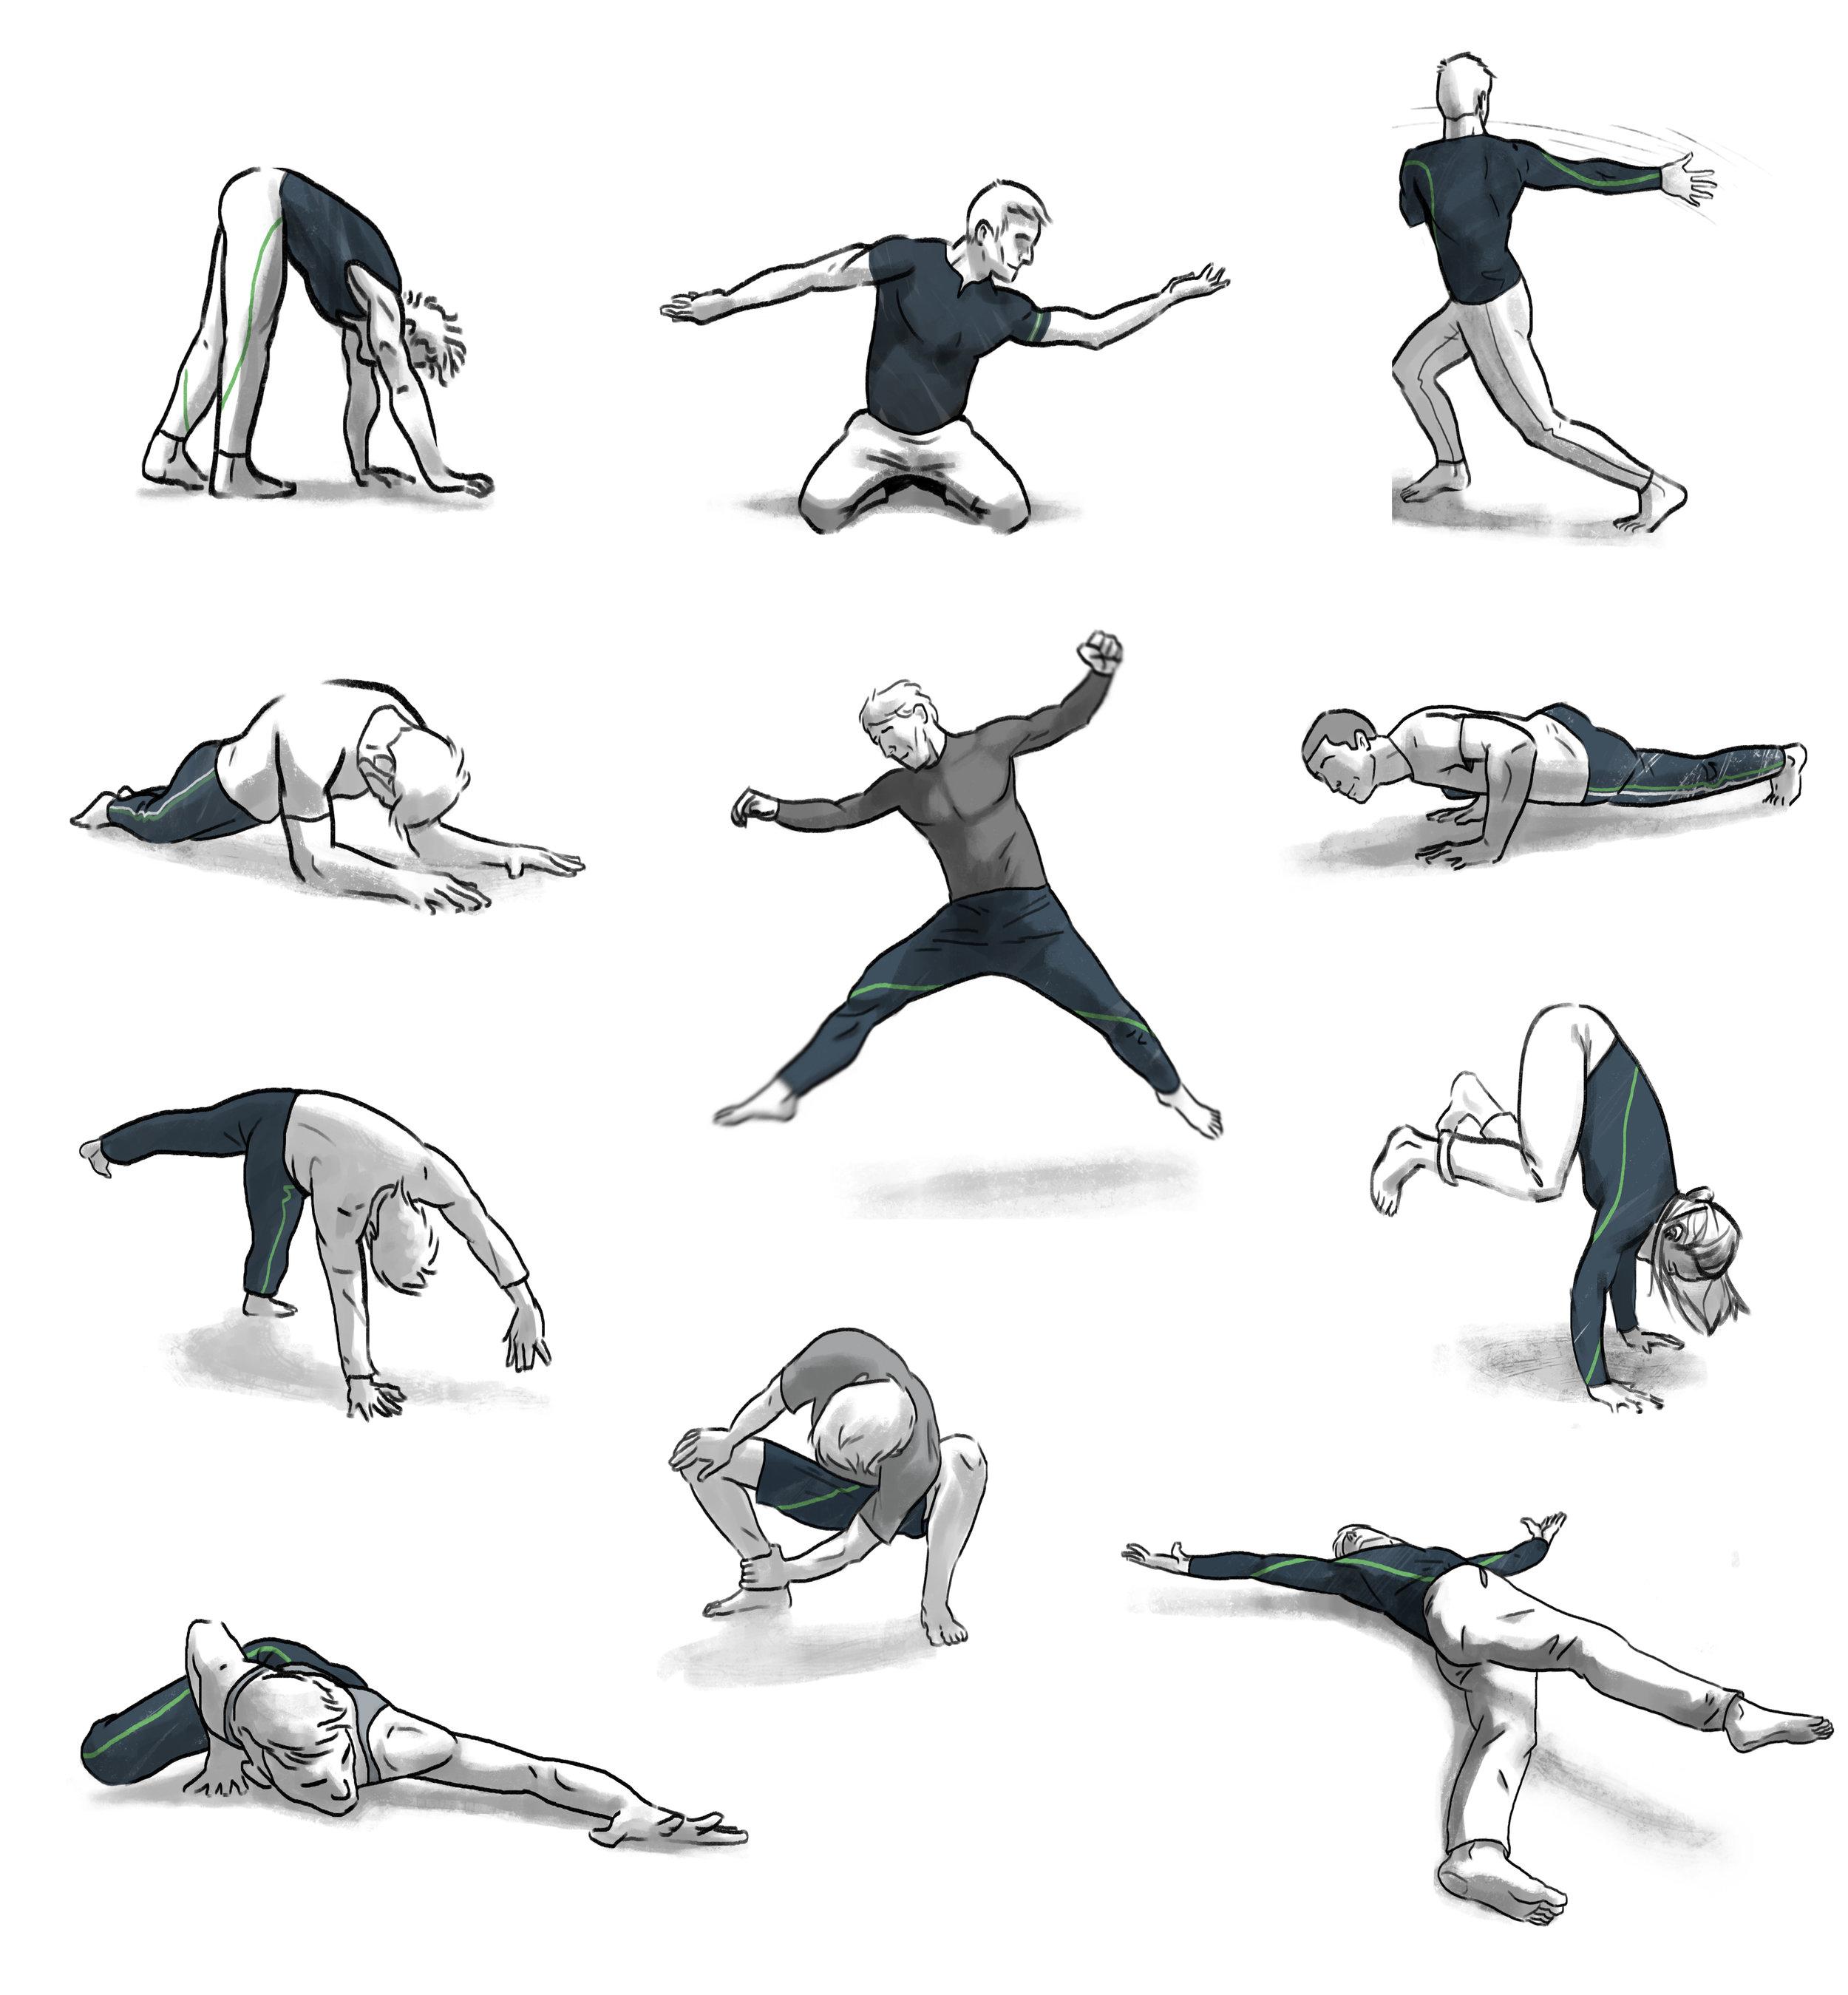 aekuus-body-workout-exercise-fitness-training.jpg